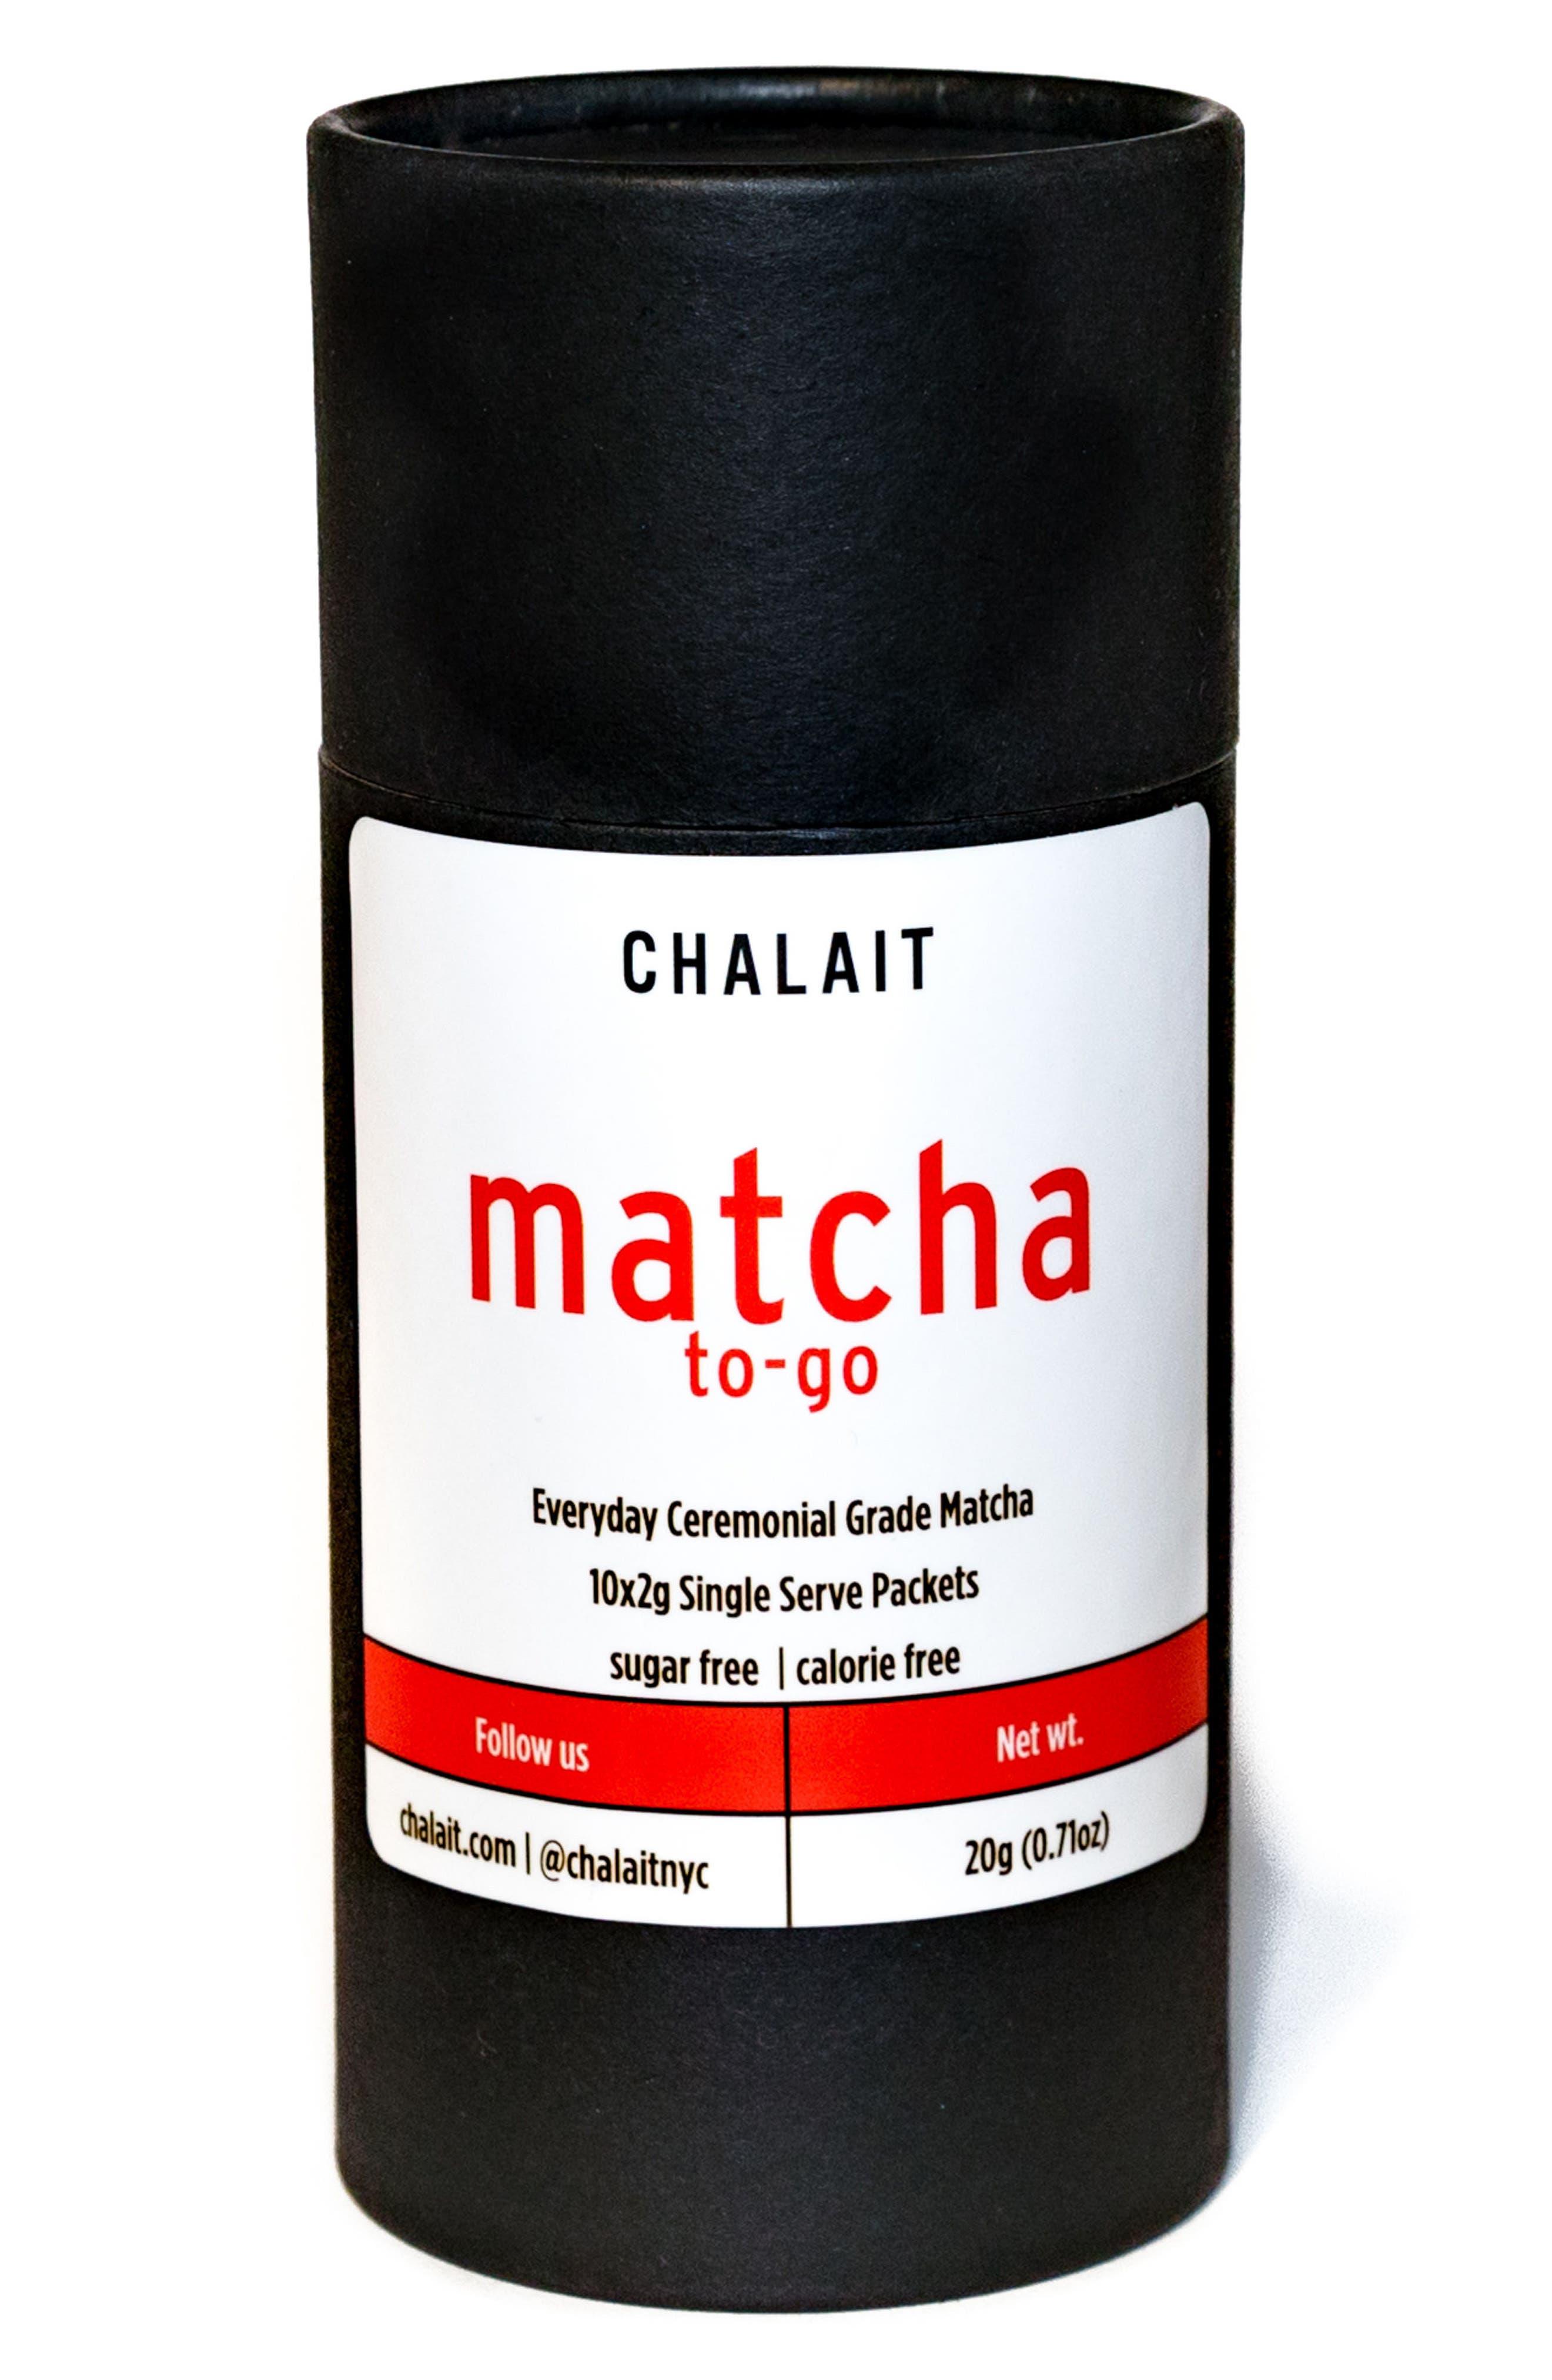 Alternate Image 1 Selected - Chalait Ceremonial Everyday Matcha To-Go Sticks